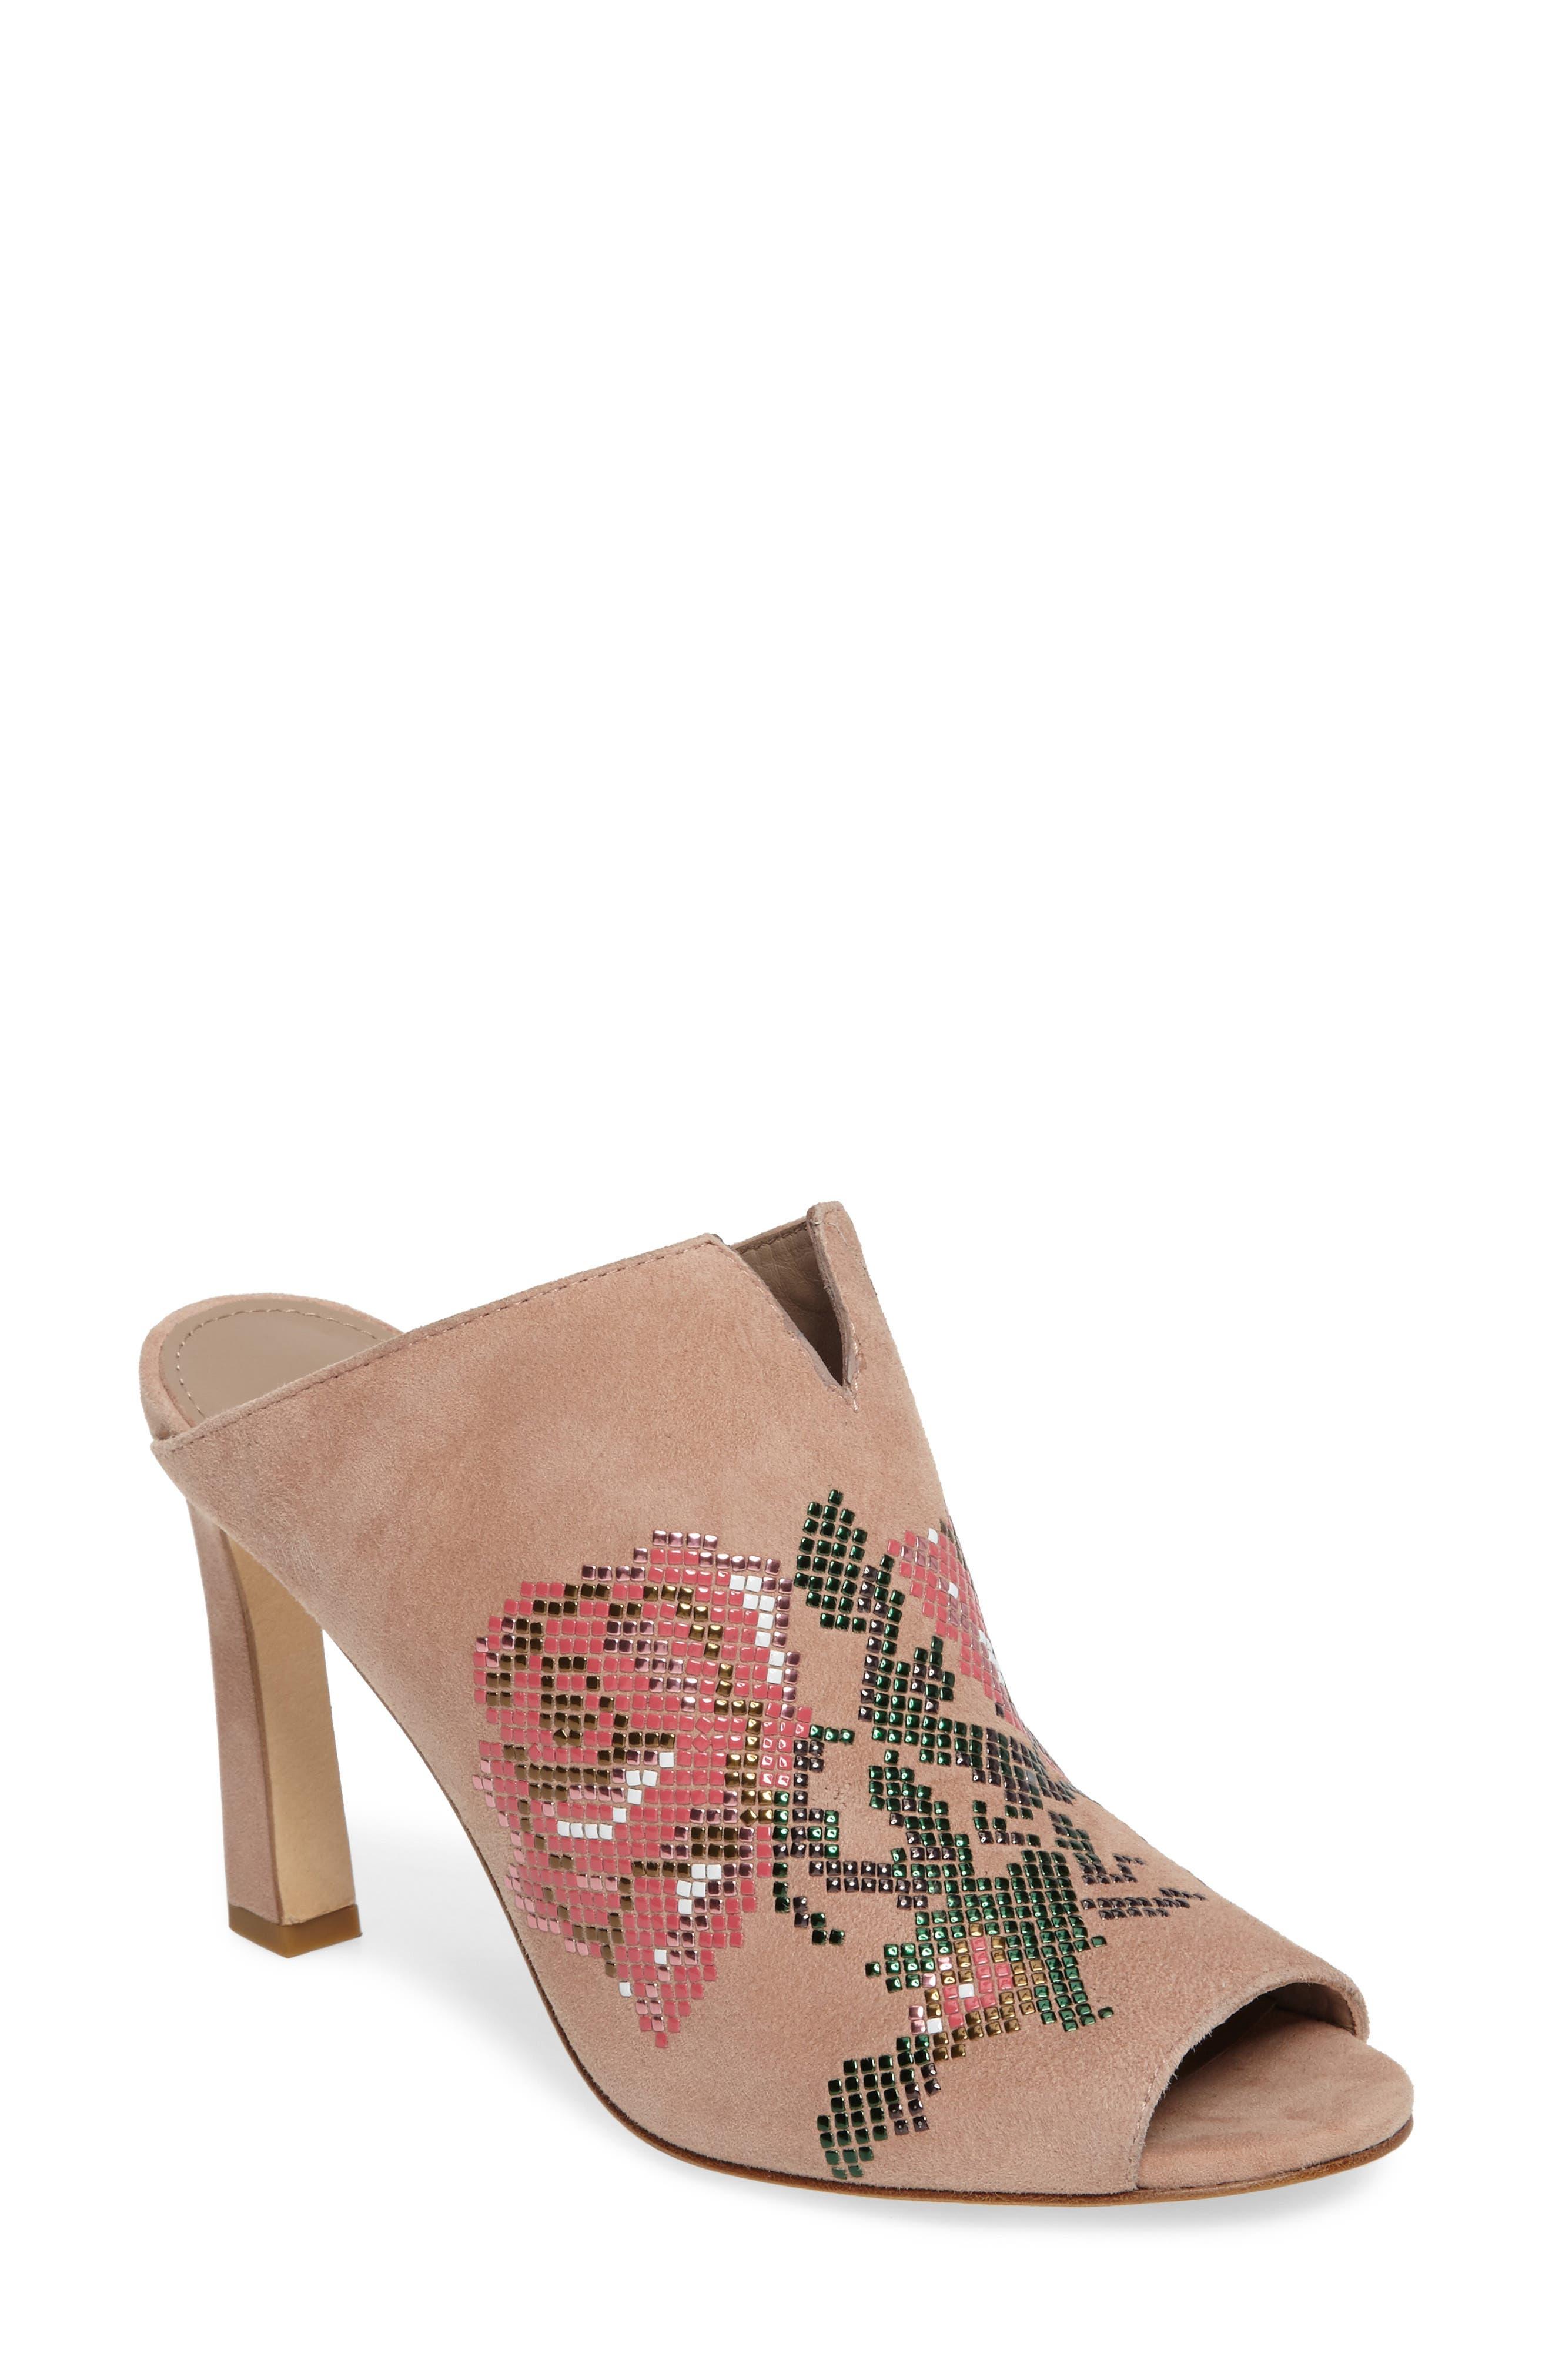 Alternate Image 1 Selected - Donald Pliner Elora Embellished Open-Toe Mule (Women)